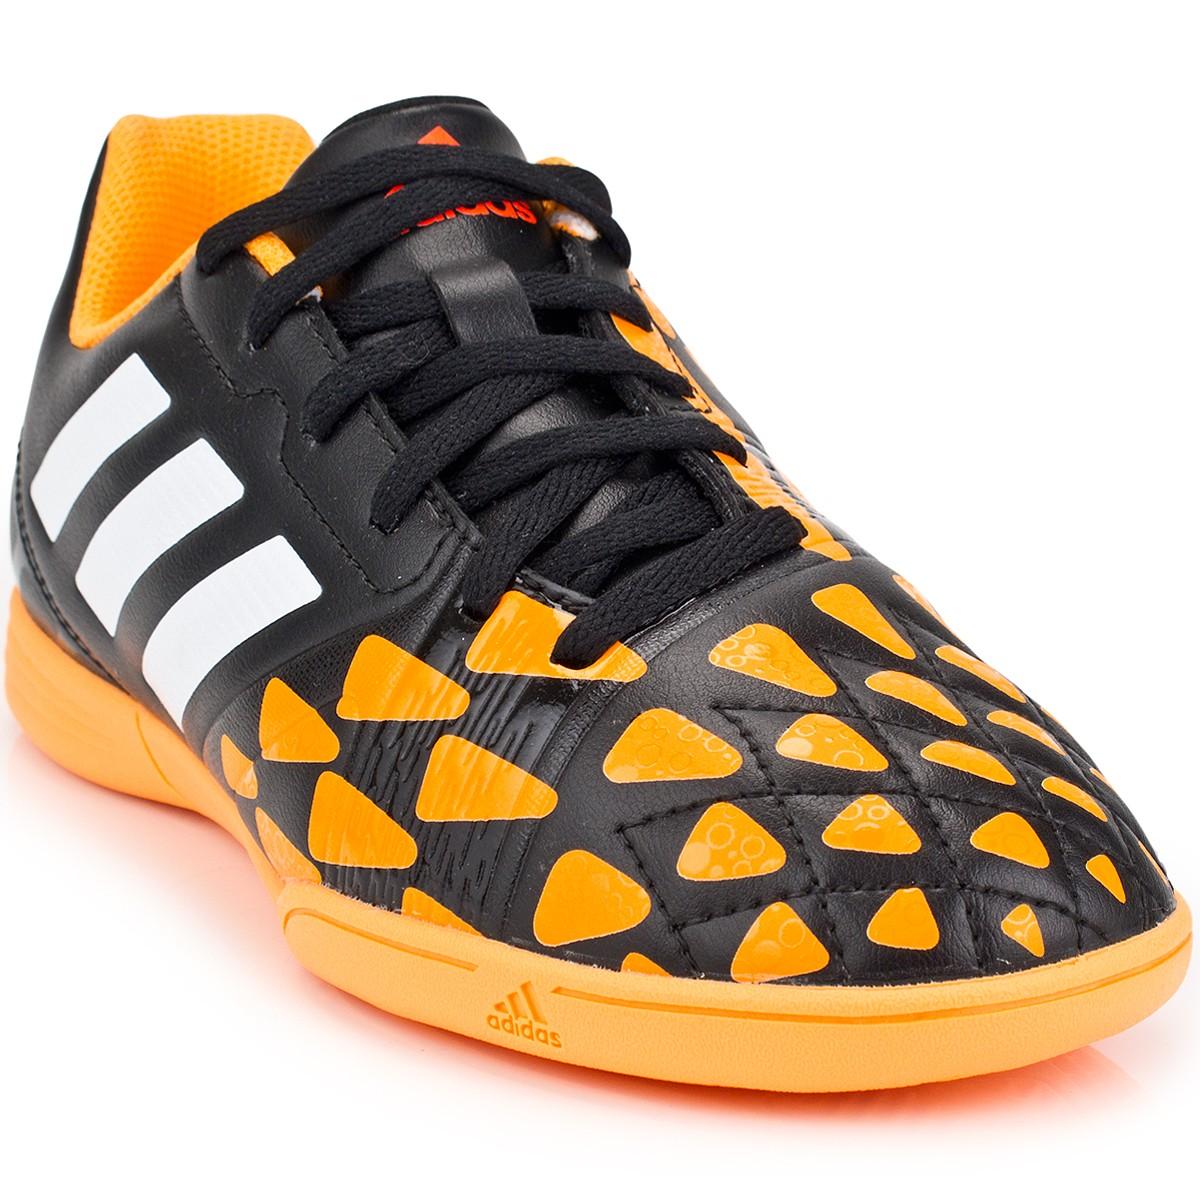 429d58b8731 Chuteira Adidas Futsal Nitrocharge 3.0 IN Jr